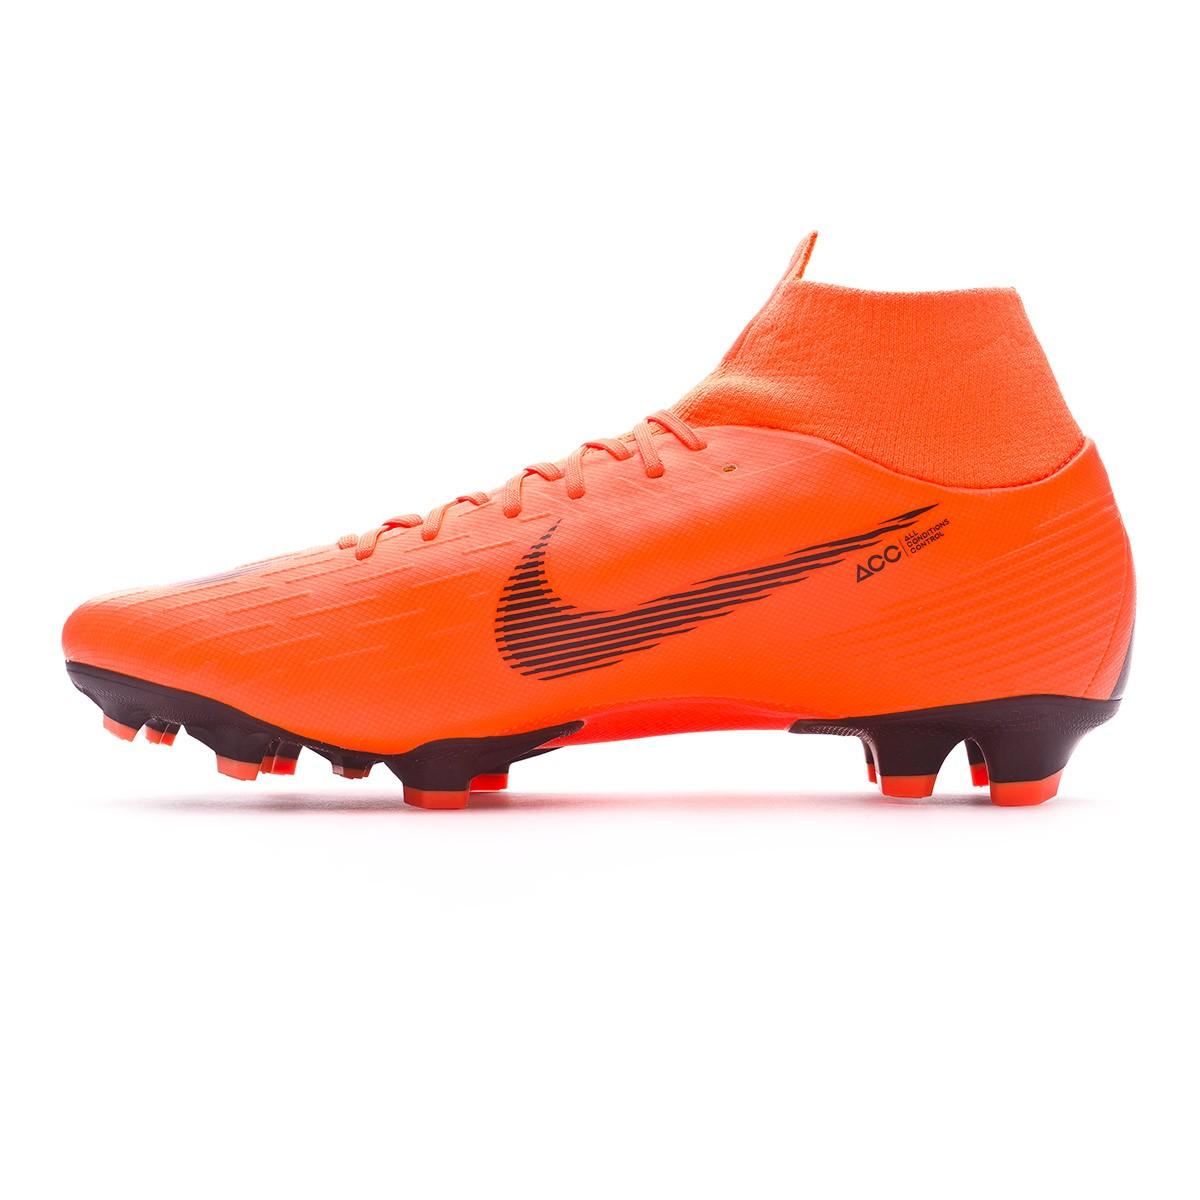 f306e1d56 Football Boots Nike Mercurial Superfly VI Pro FG Total orange-Black-Volt -  Football store Fútbol Emotion